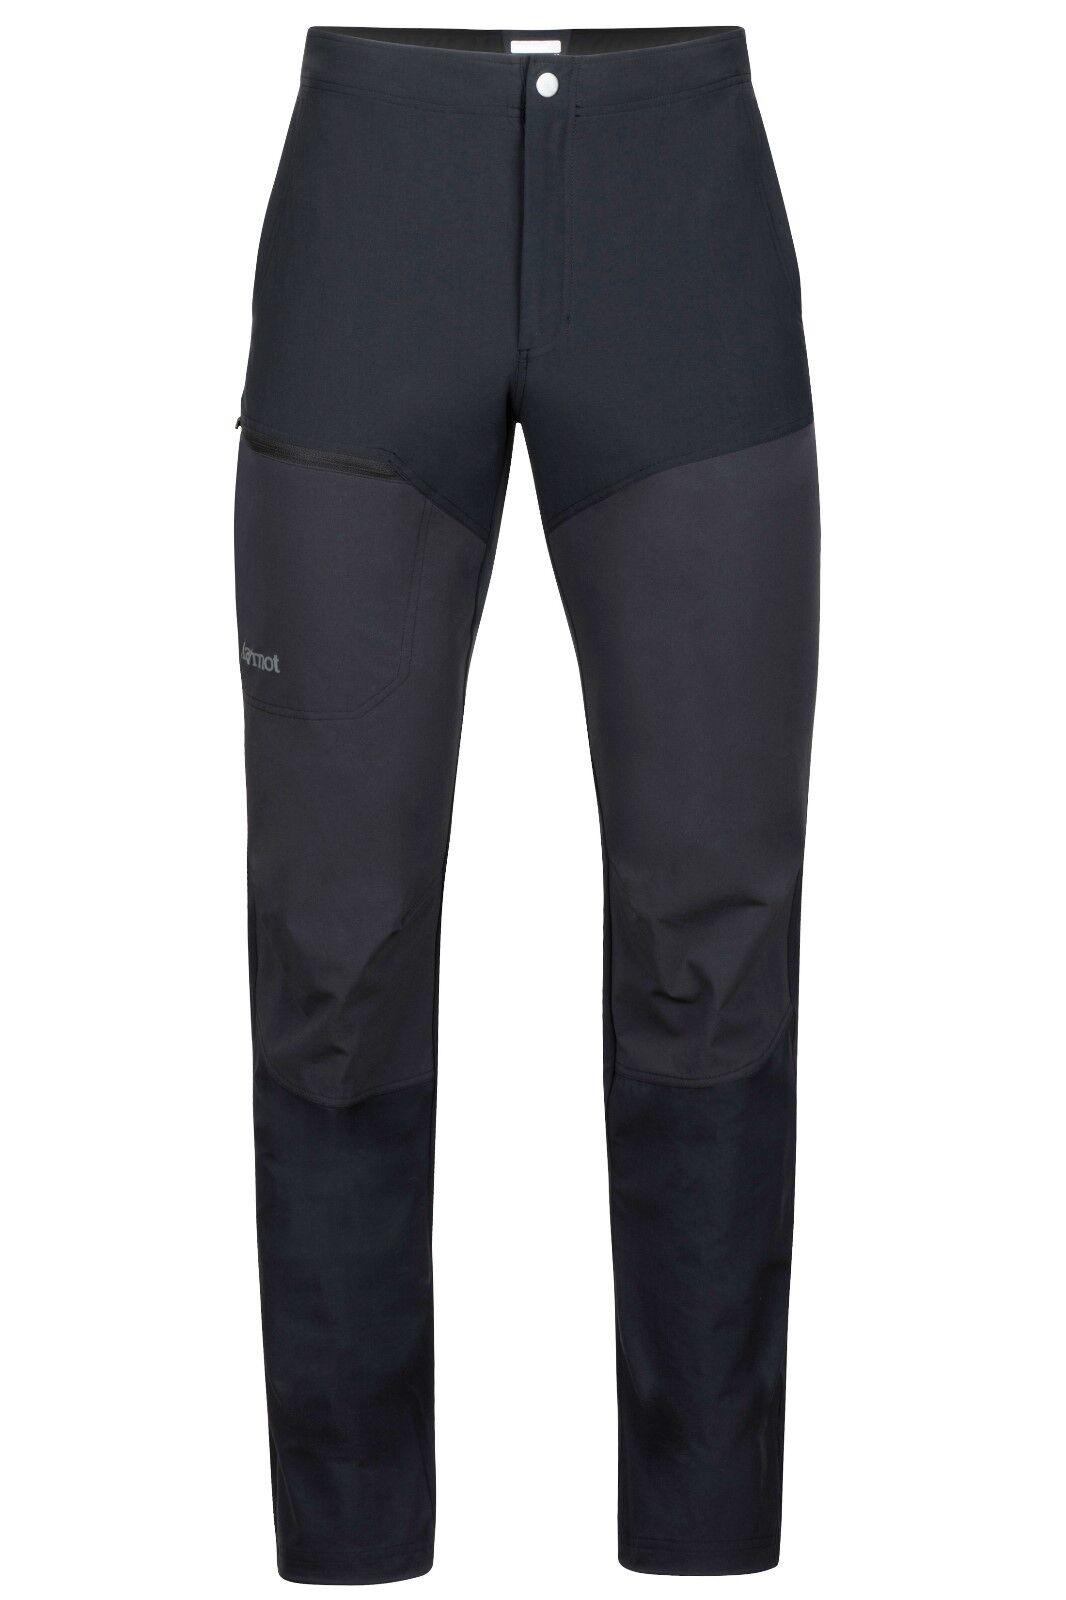 Marmot Scrambler Pantalones, Pantalones Softshell para hombre, negro